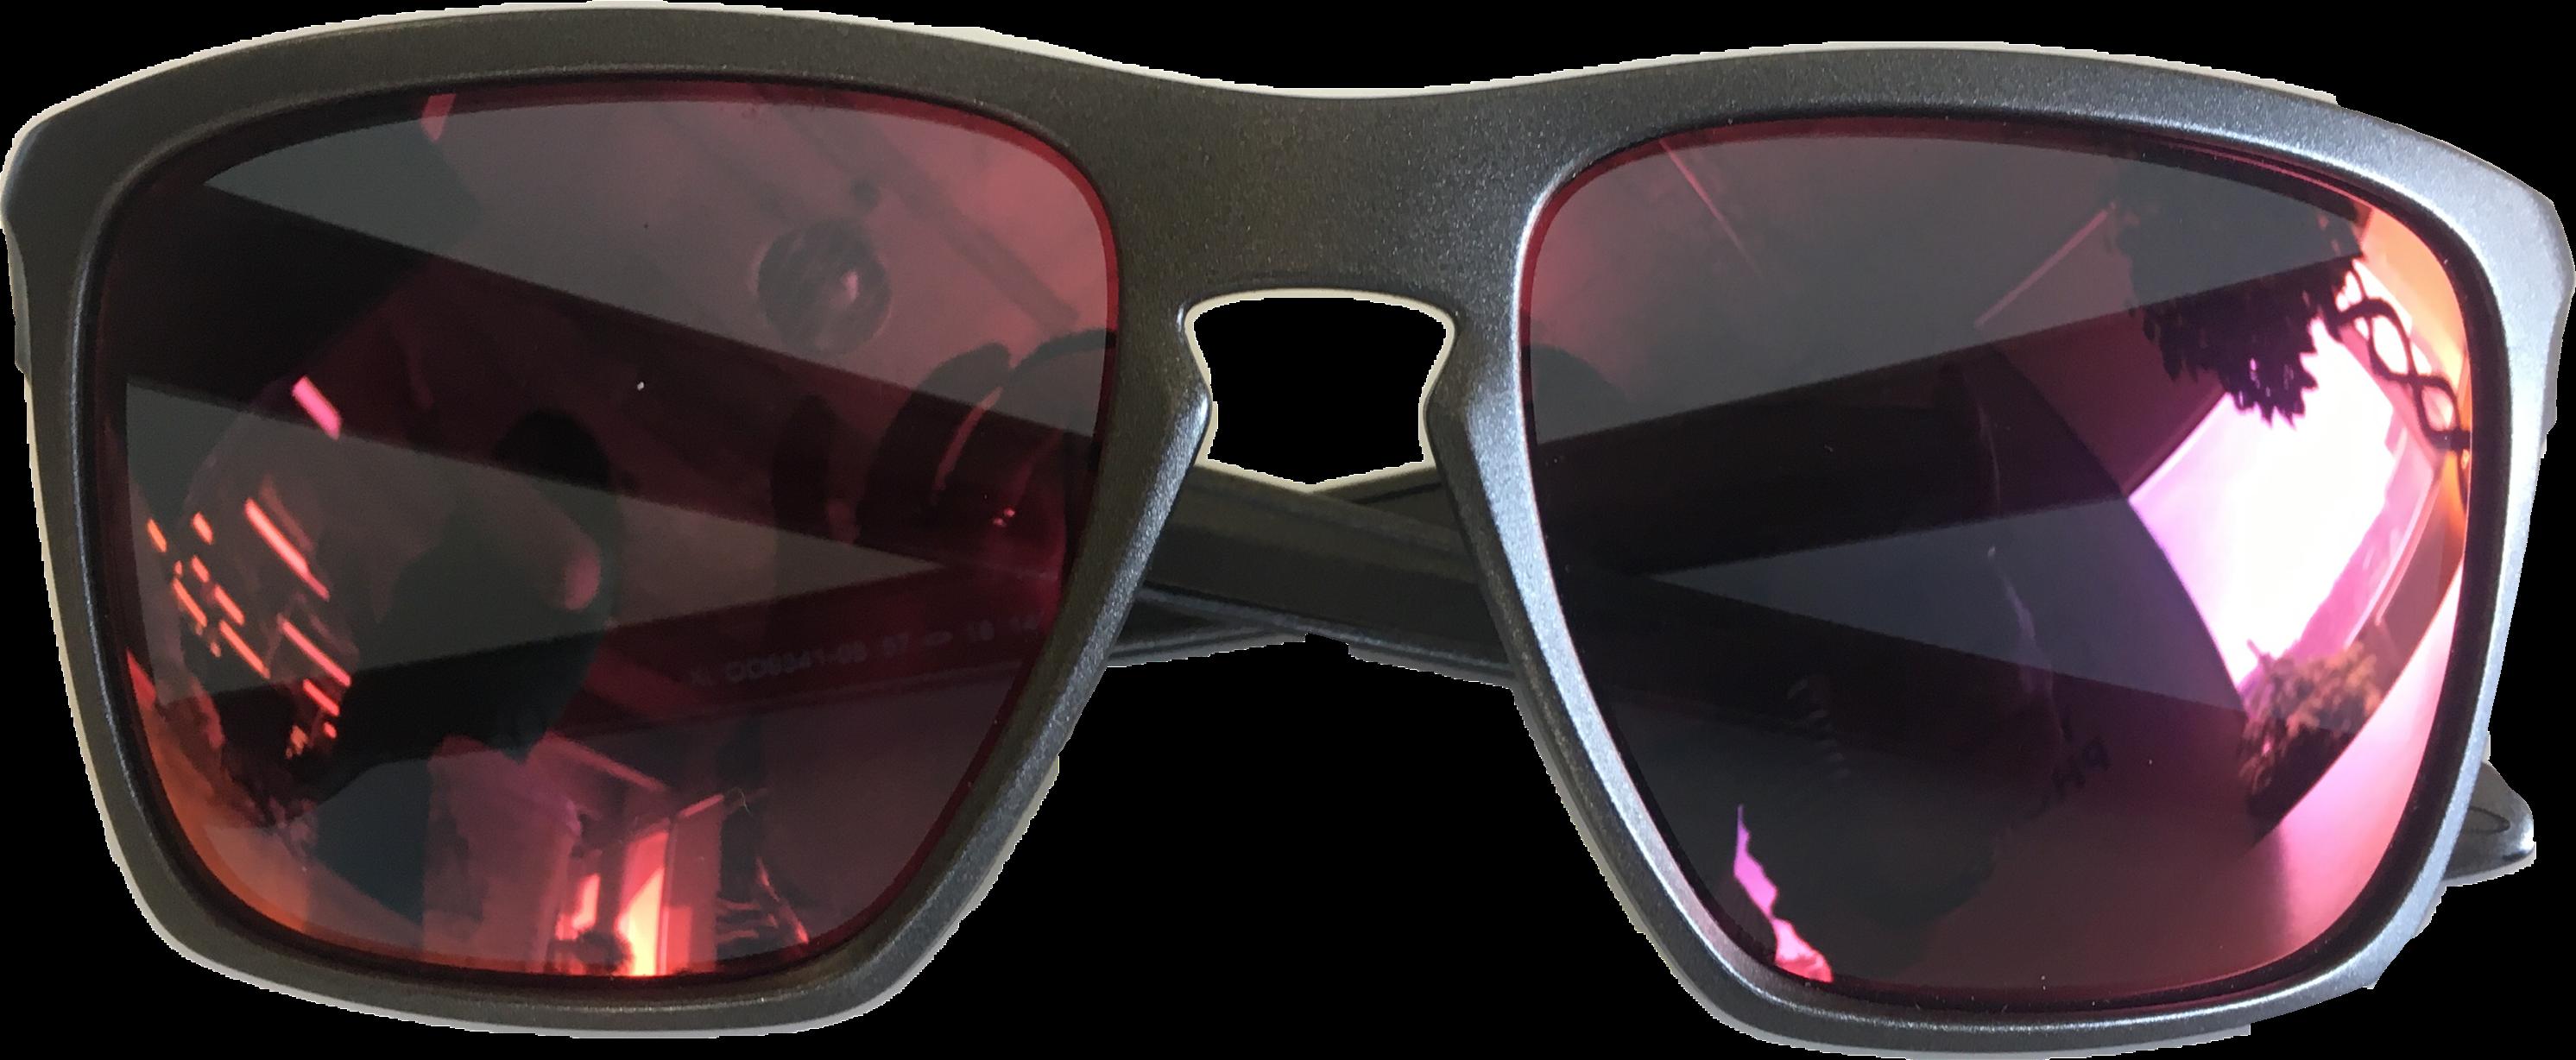 Sunny clipart stylish glass. Eyeglasses sunglasses cool summer